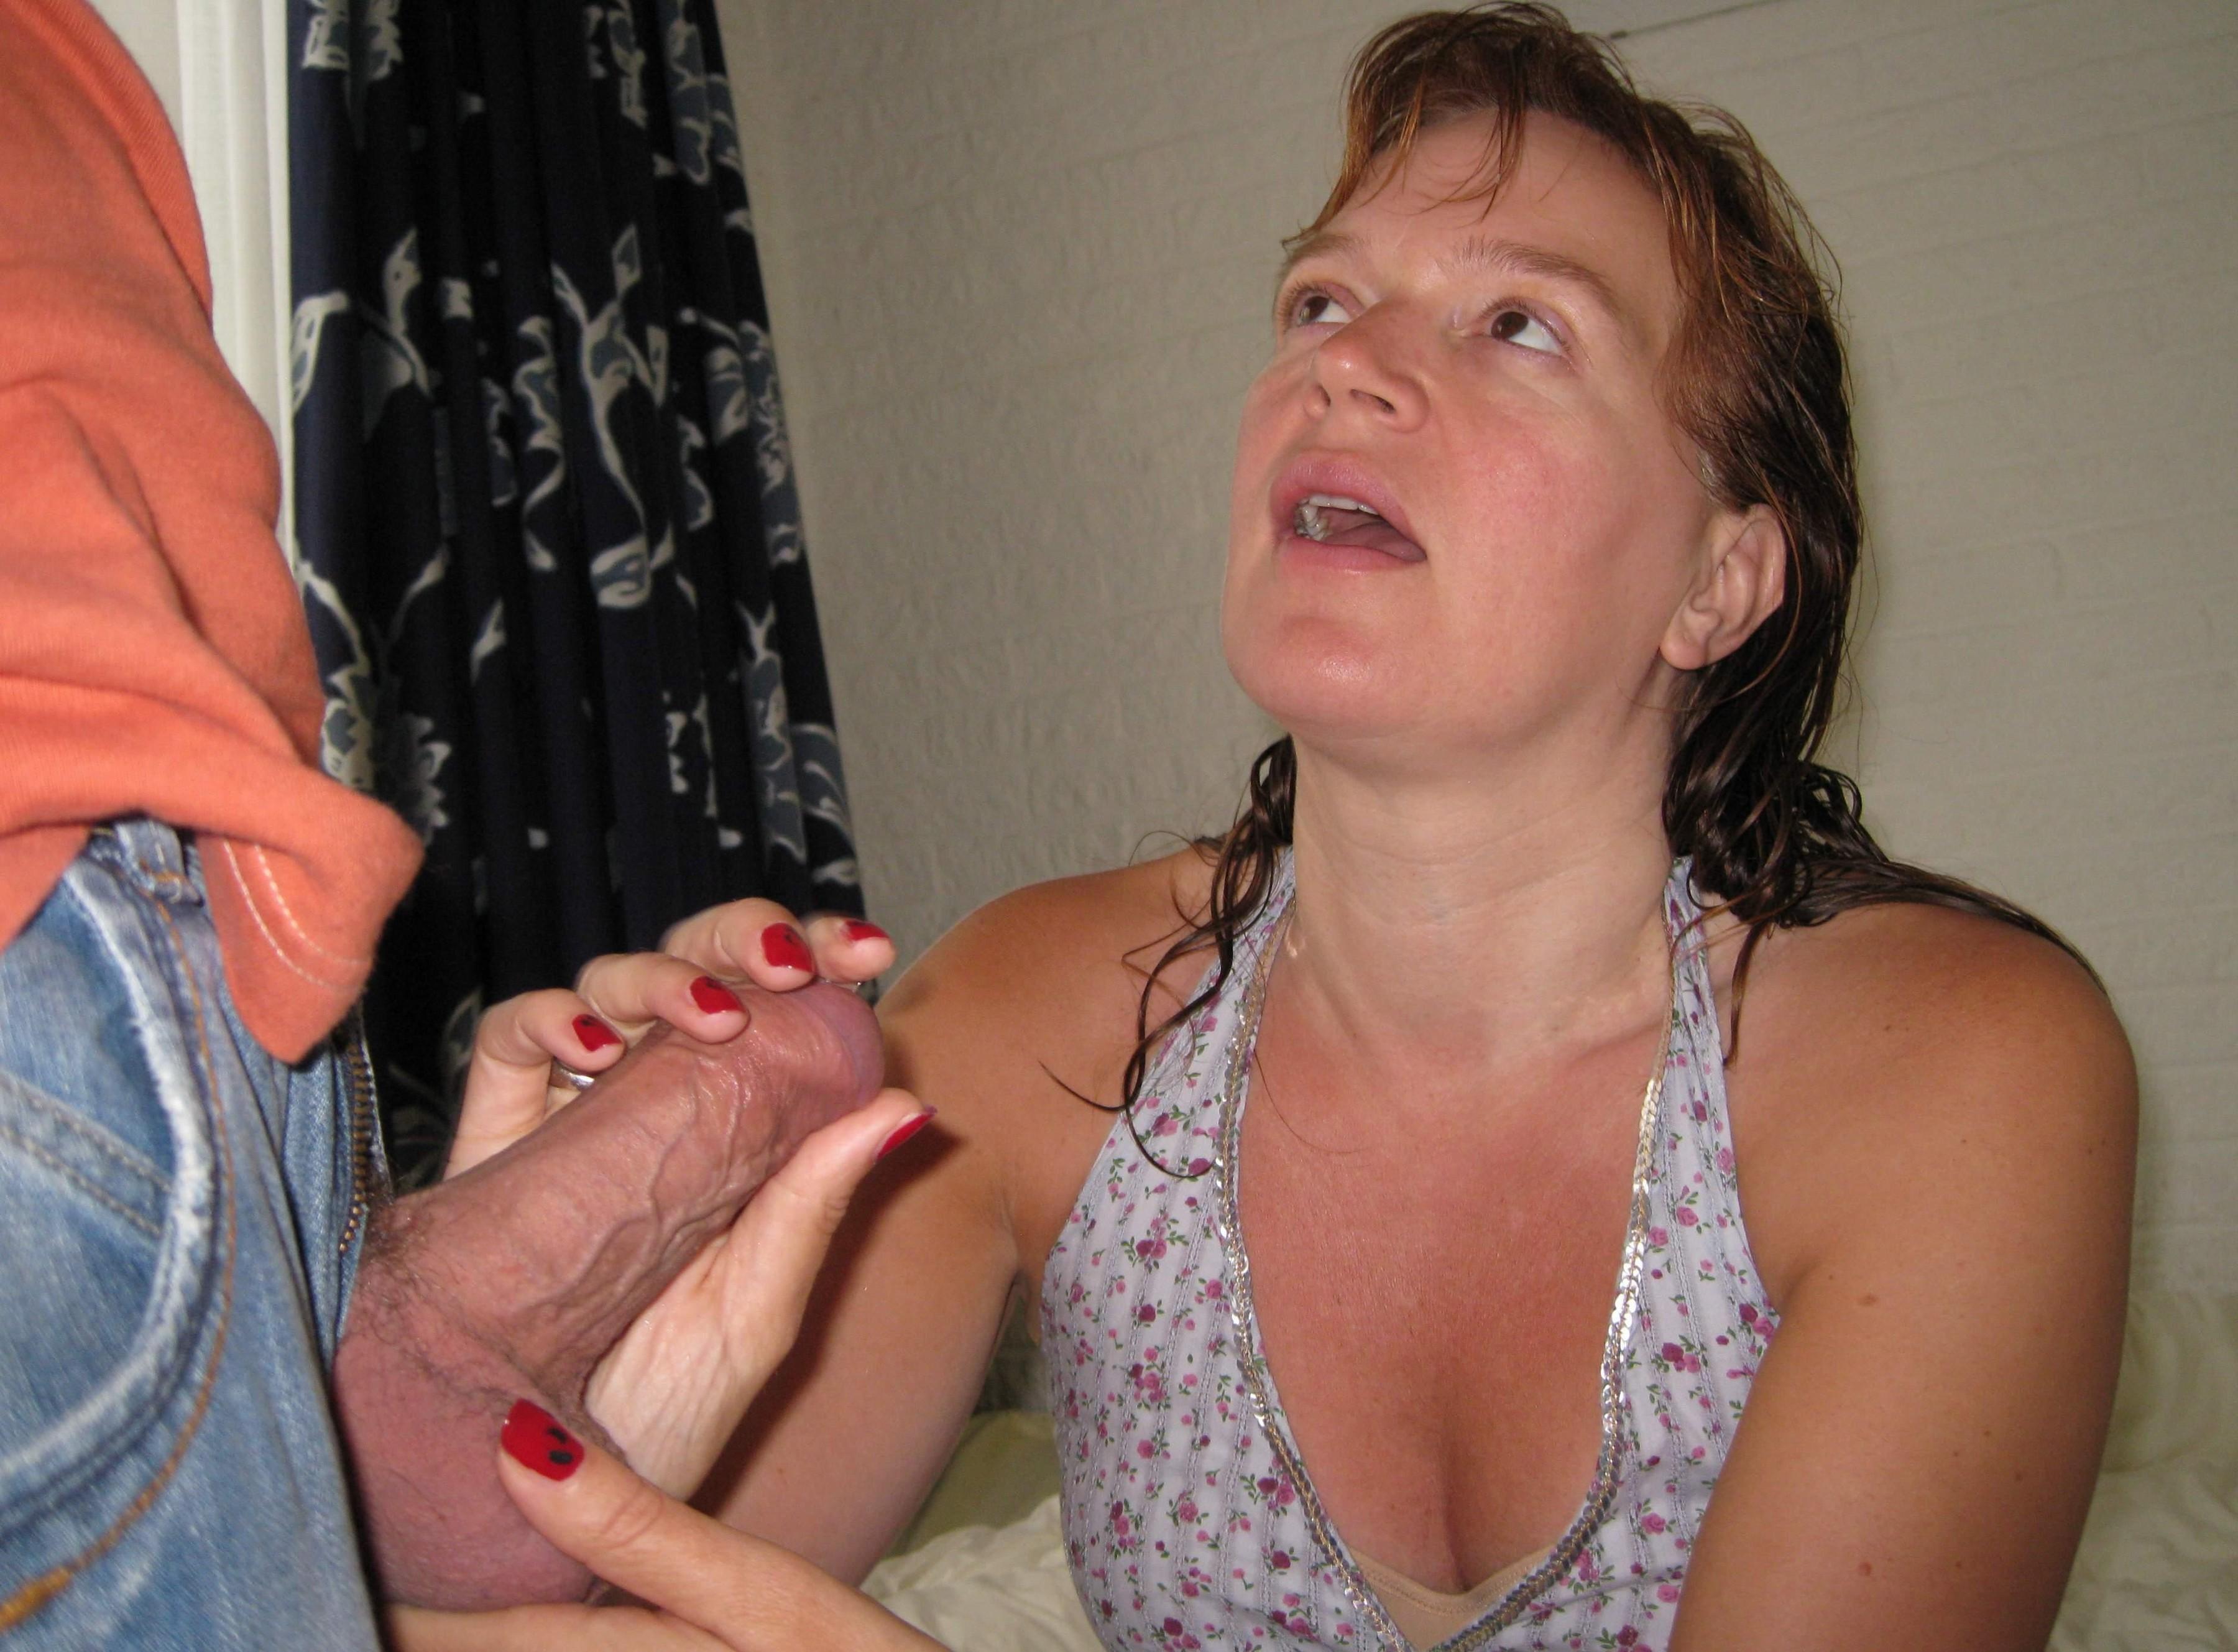 Hot women dildo nude